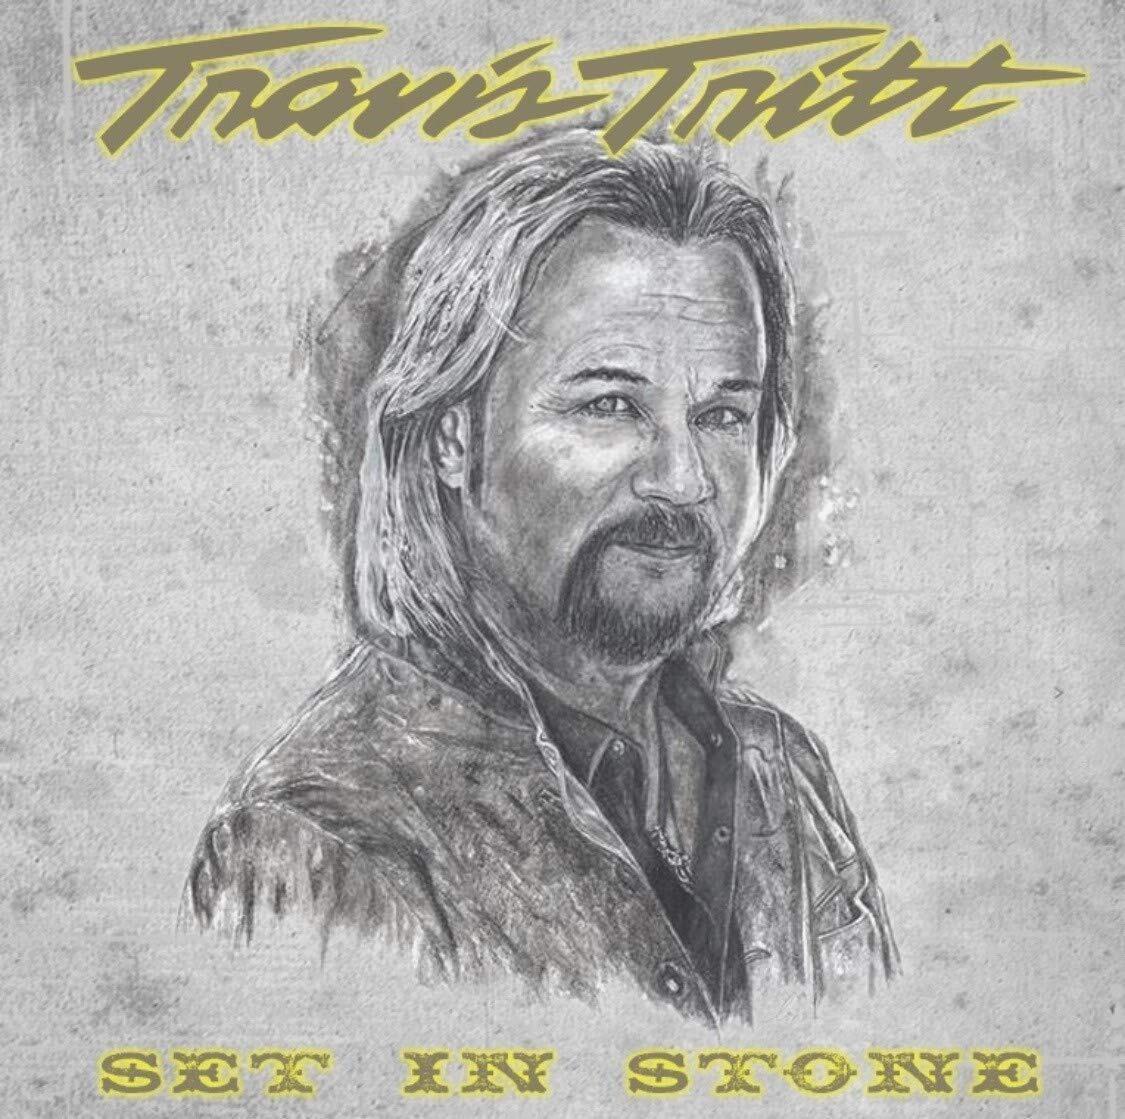 Travis Tritt- Set In Stone CD